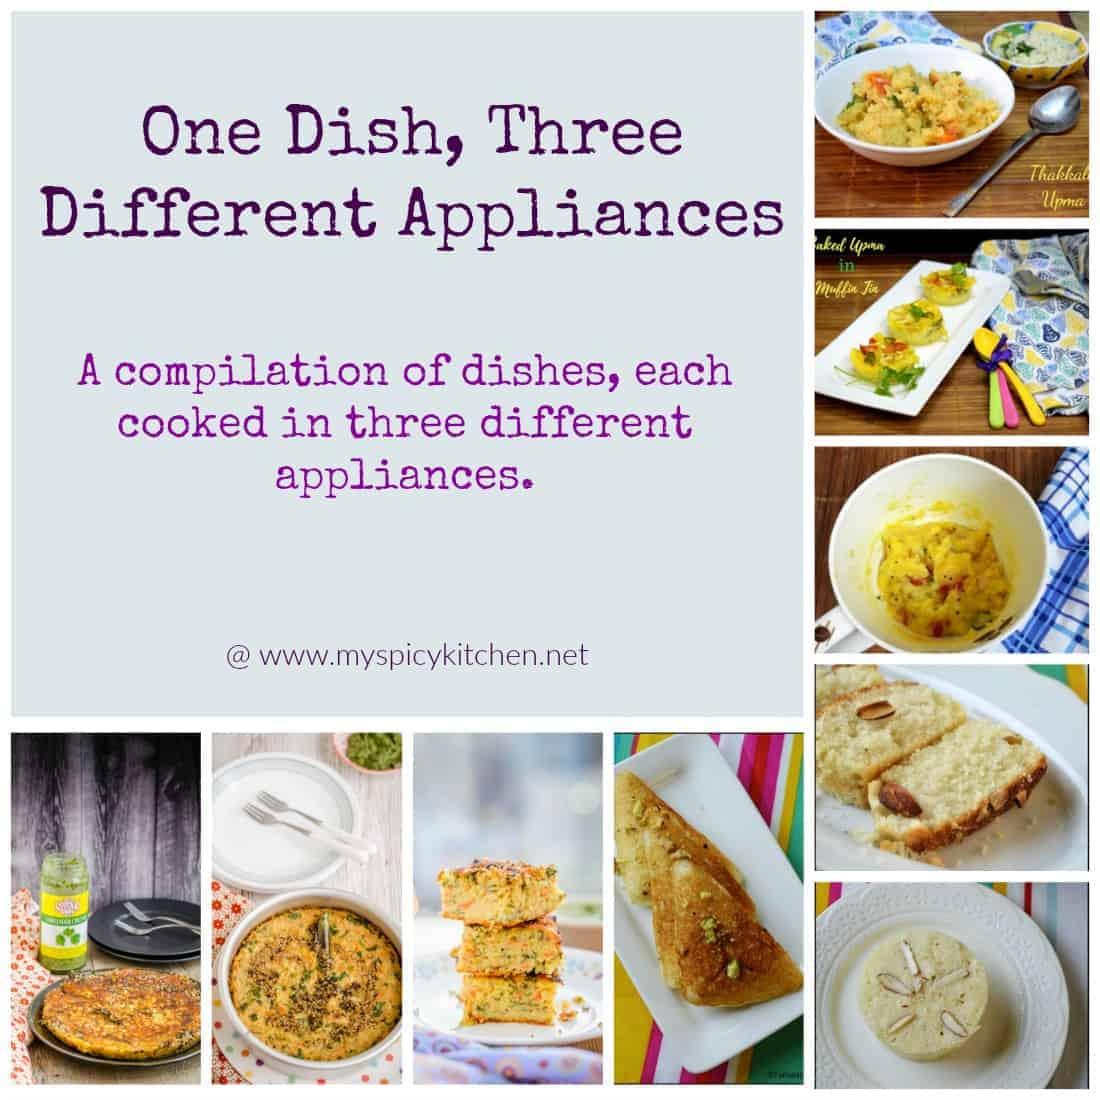 One Dish Three Different Appliances